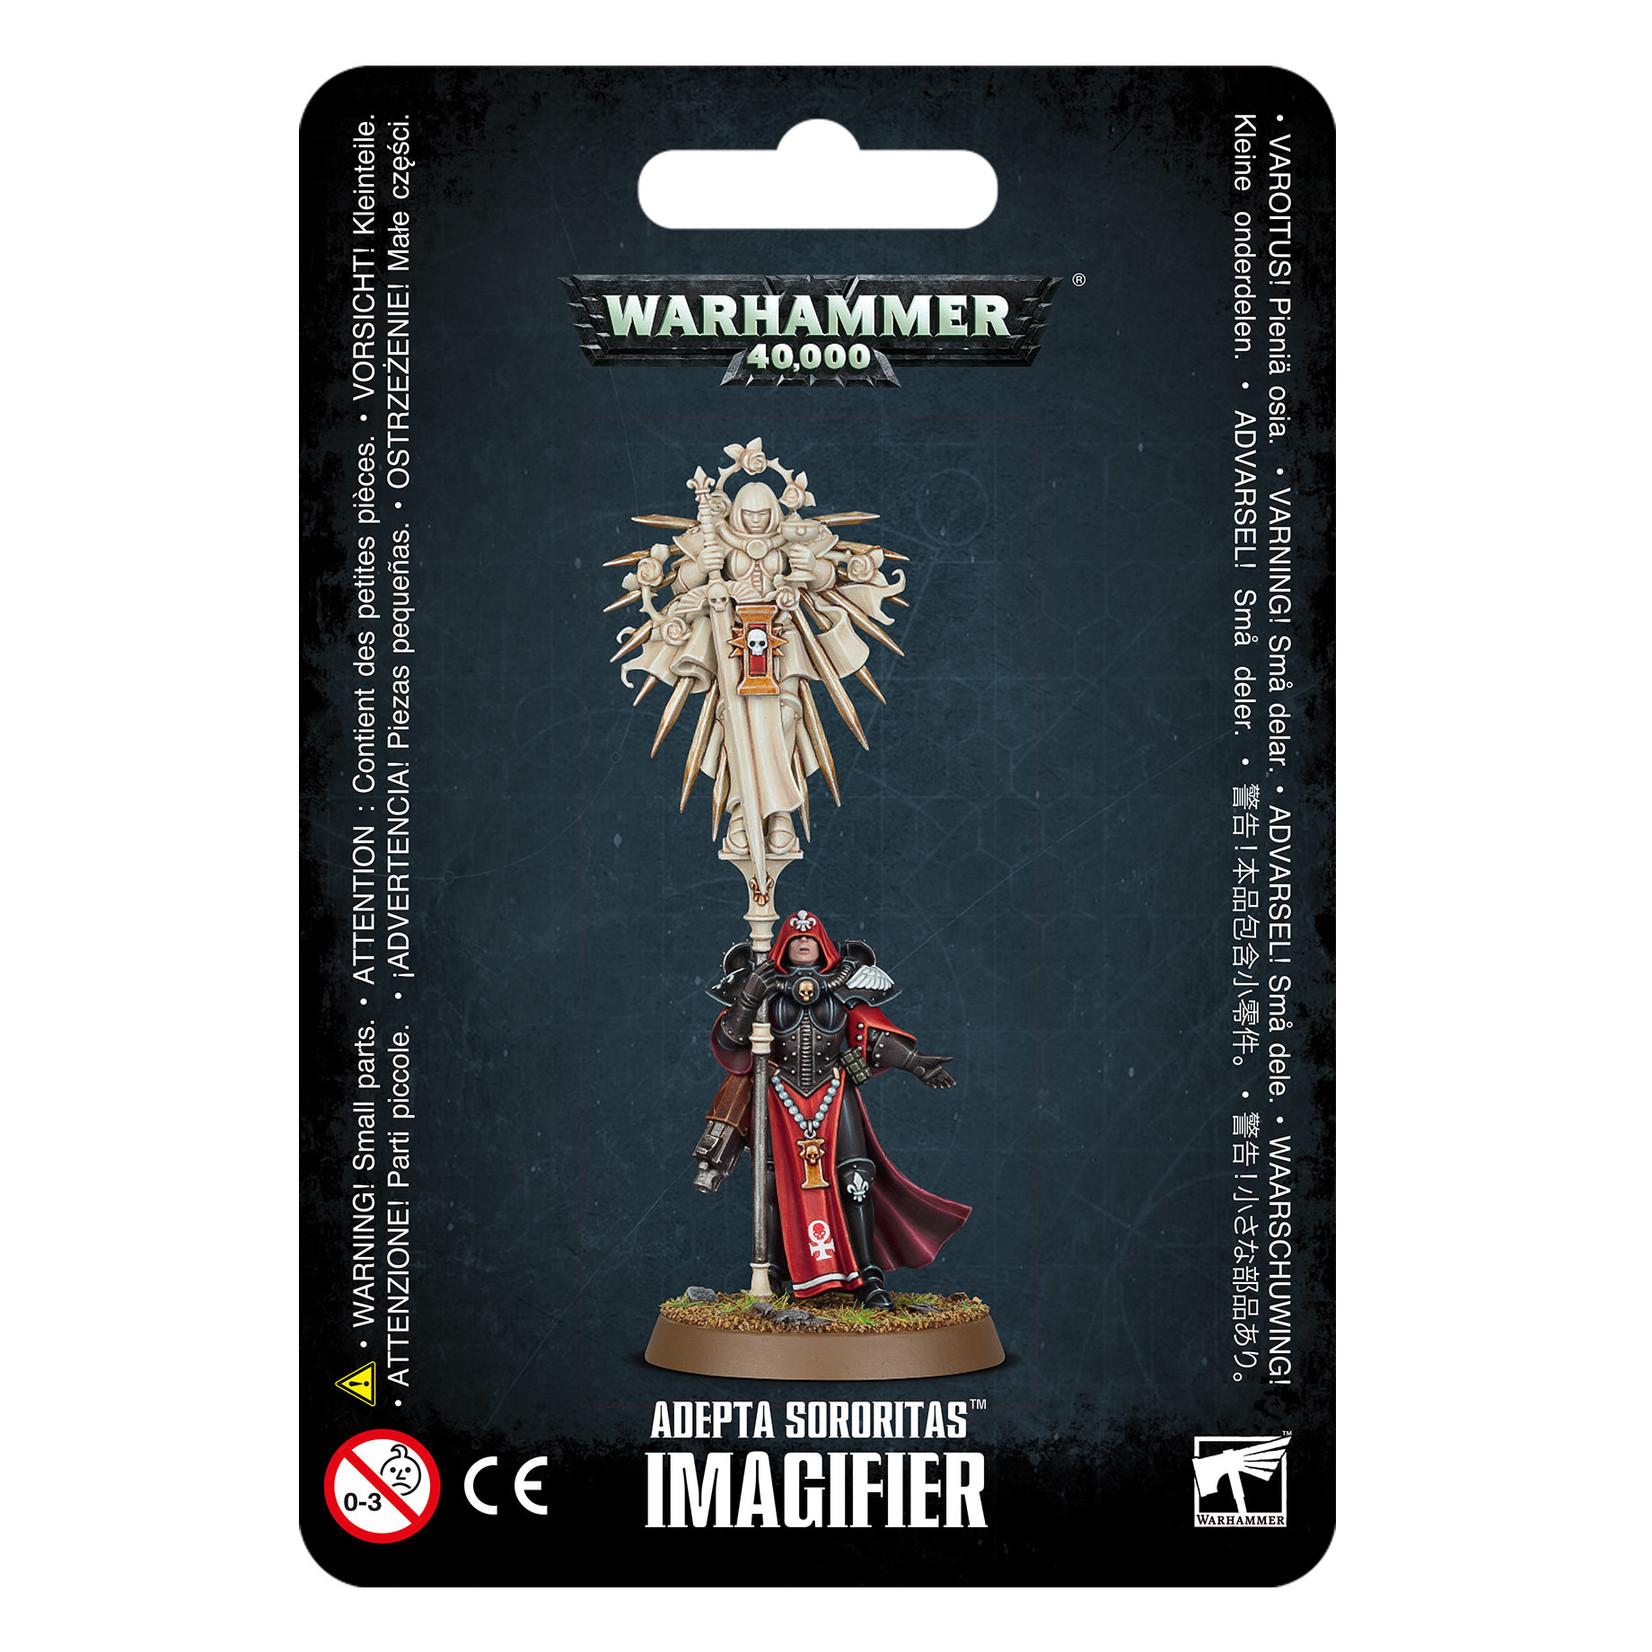 Games Workshop Imagifier